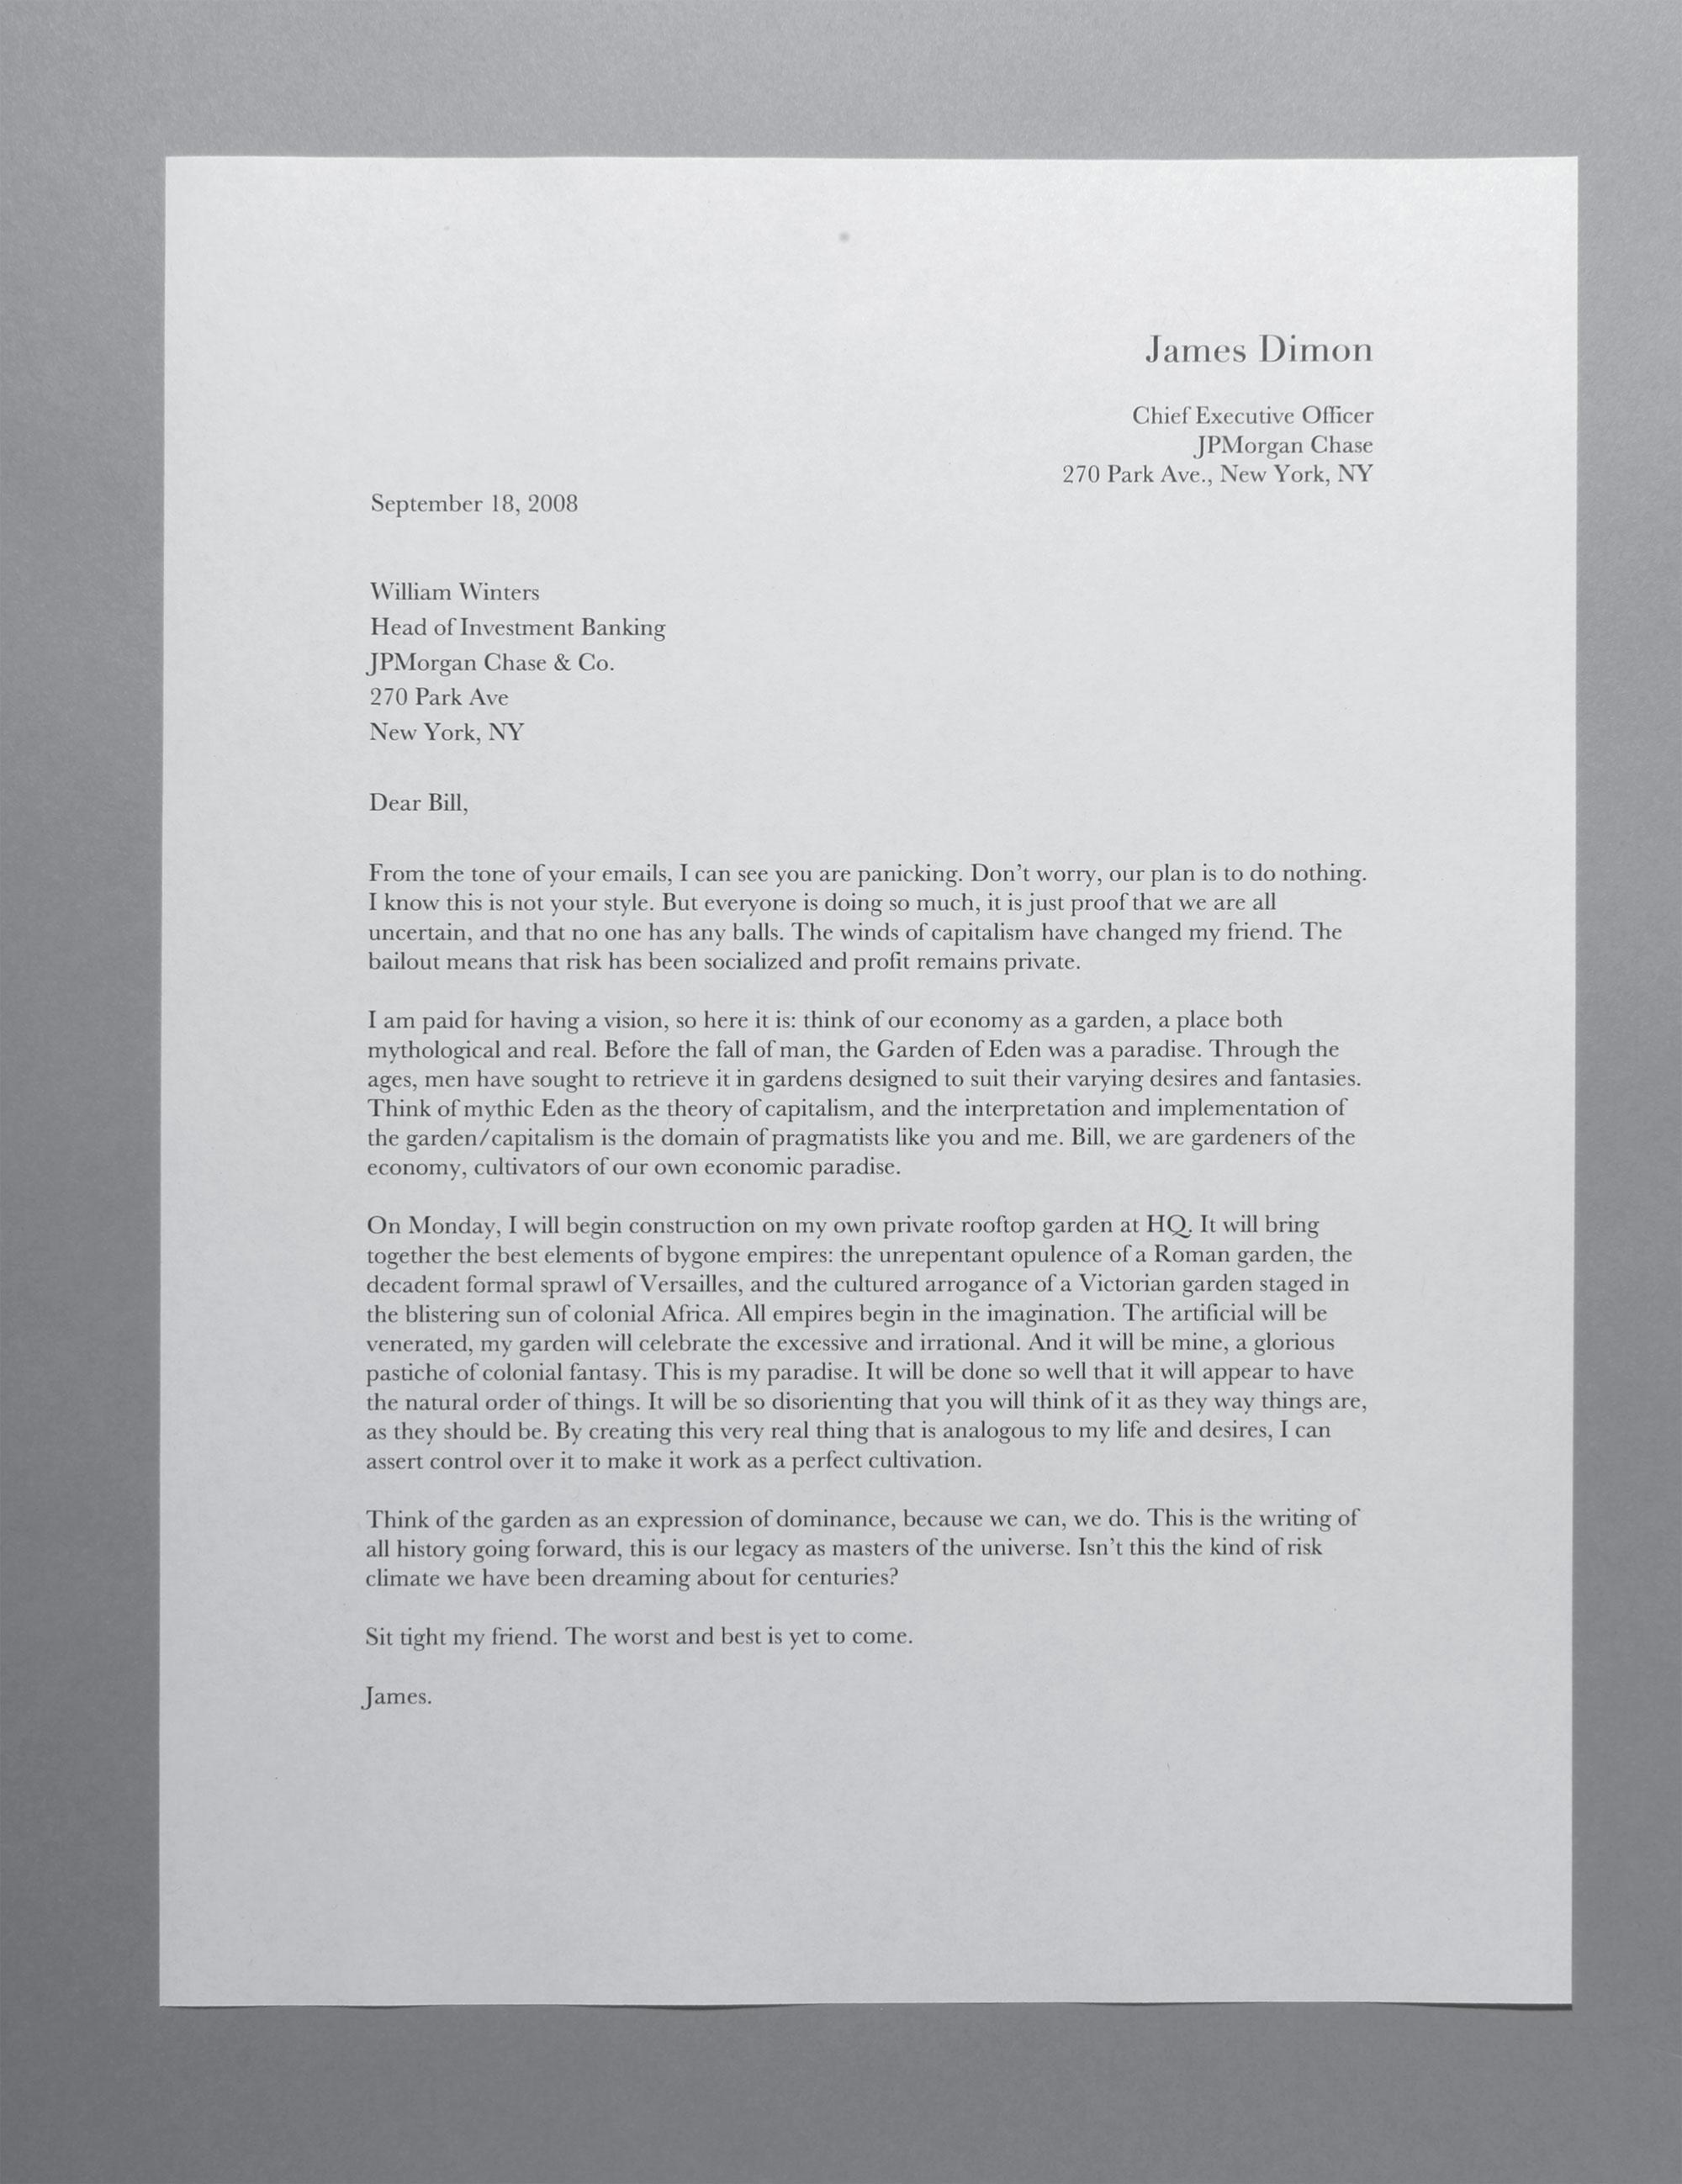 Imagining JPMorgan CEO Jamie Dimons Love Letters